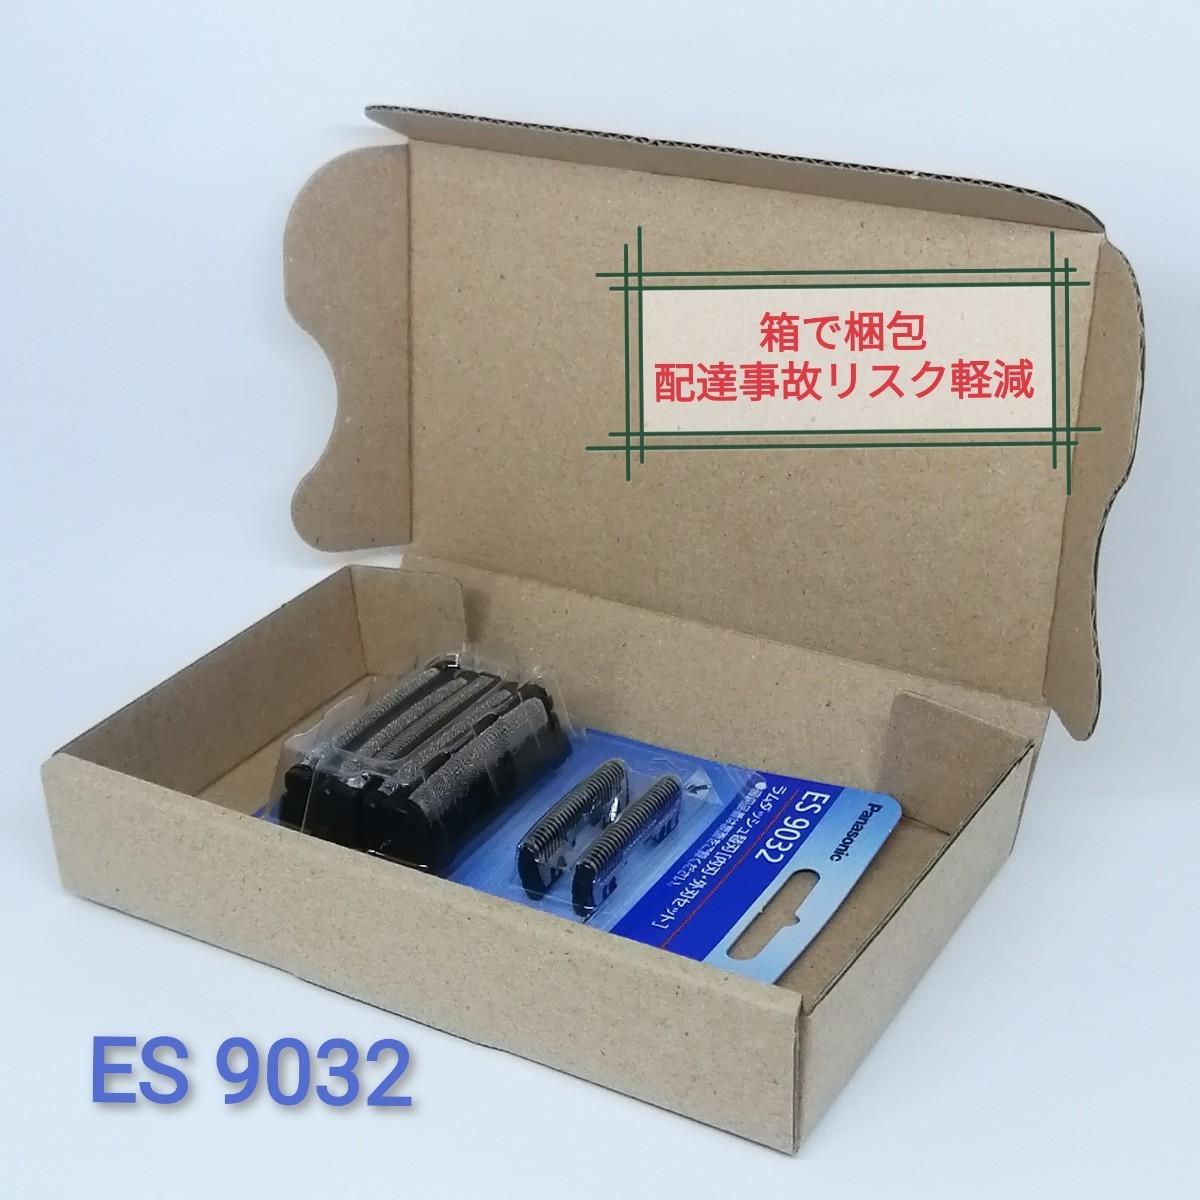 ES9032 シェーバー 替刃 パナソニック正規品★箱で梱包★(外刃・内刃セット) Panasonic